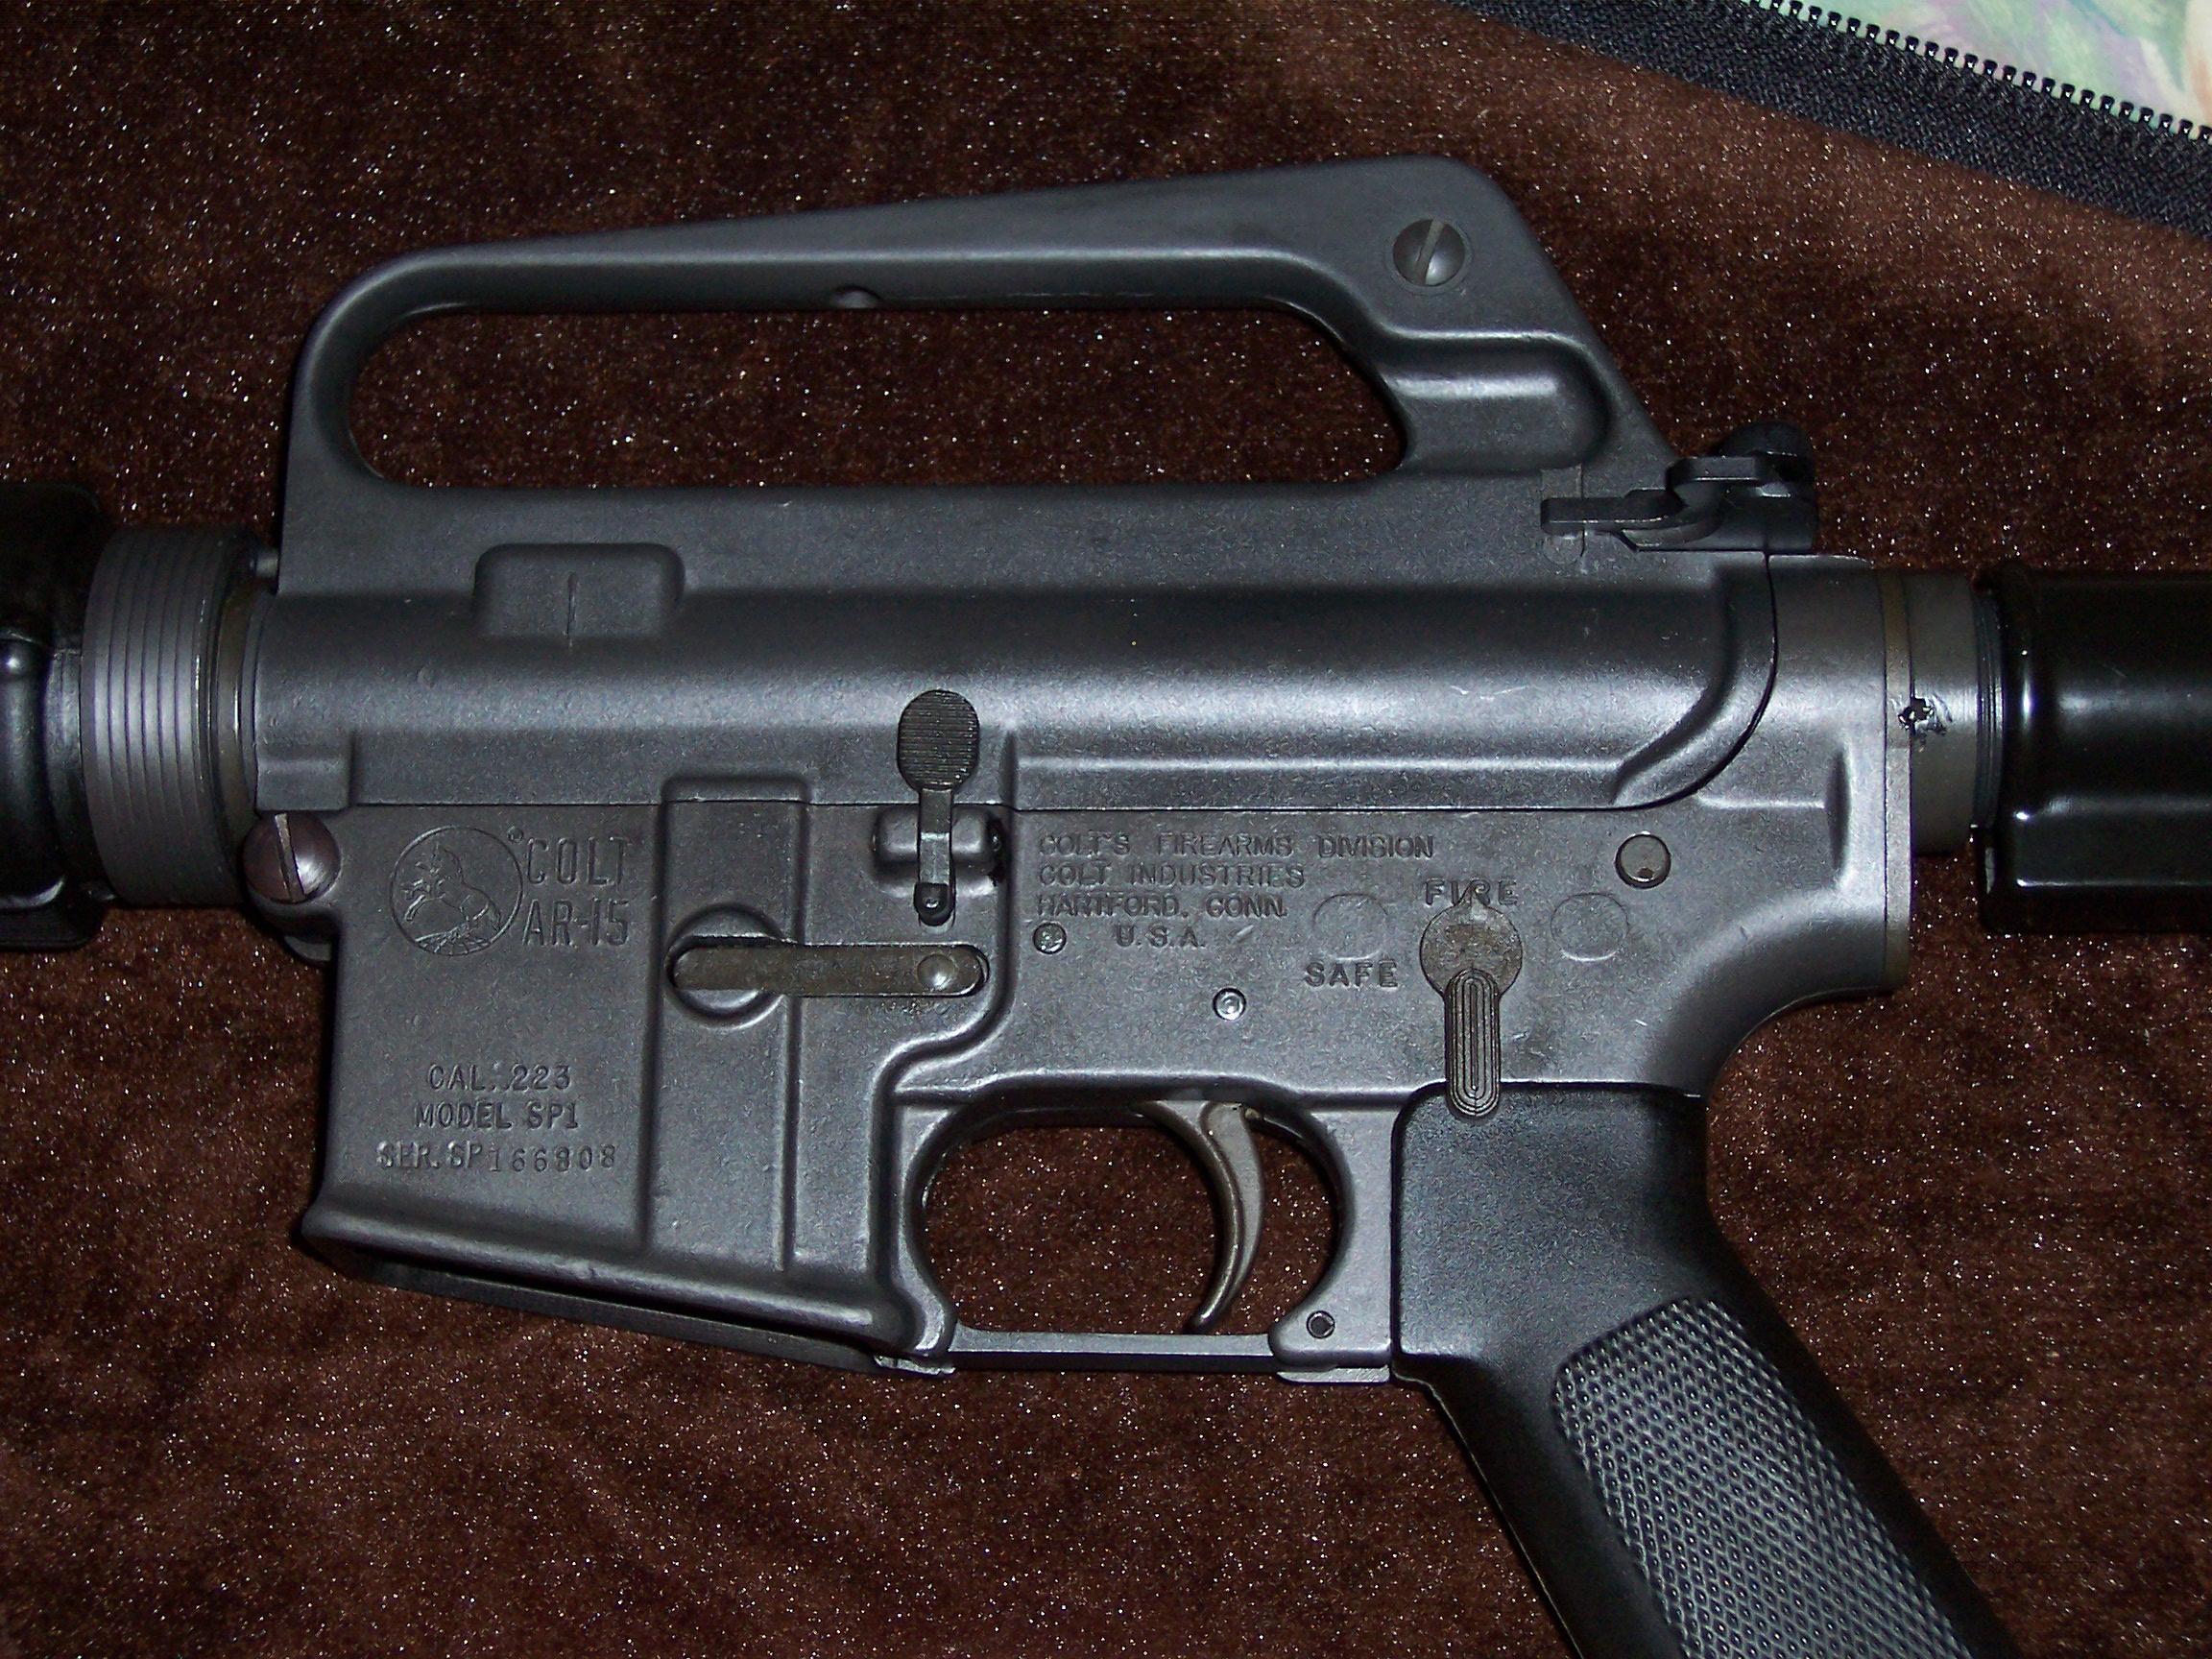 Colt Ar 15 Car 15 Sp1 Model For Sale